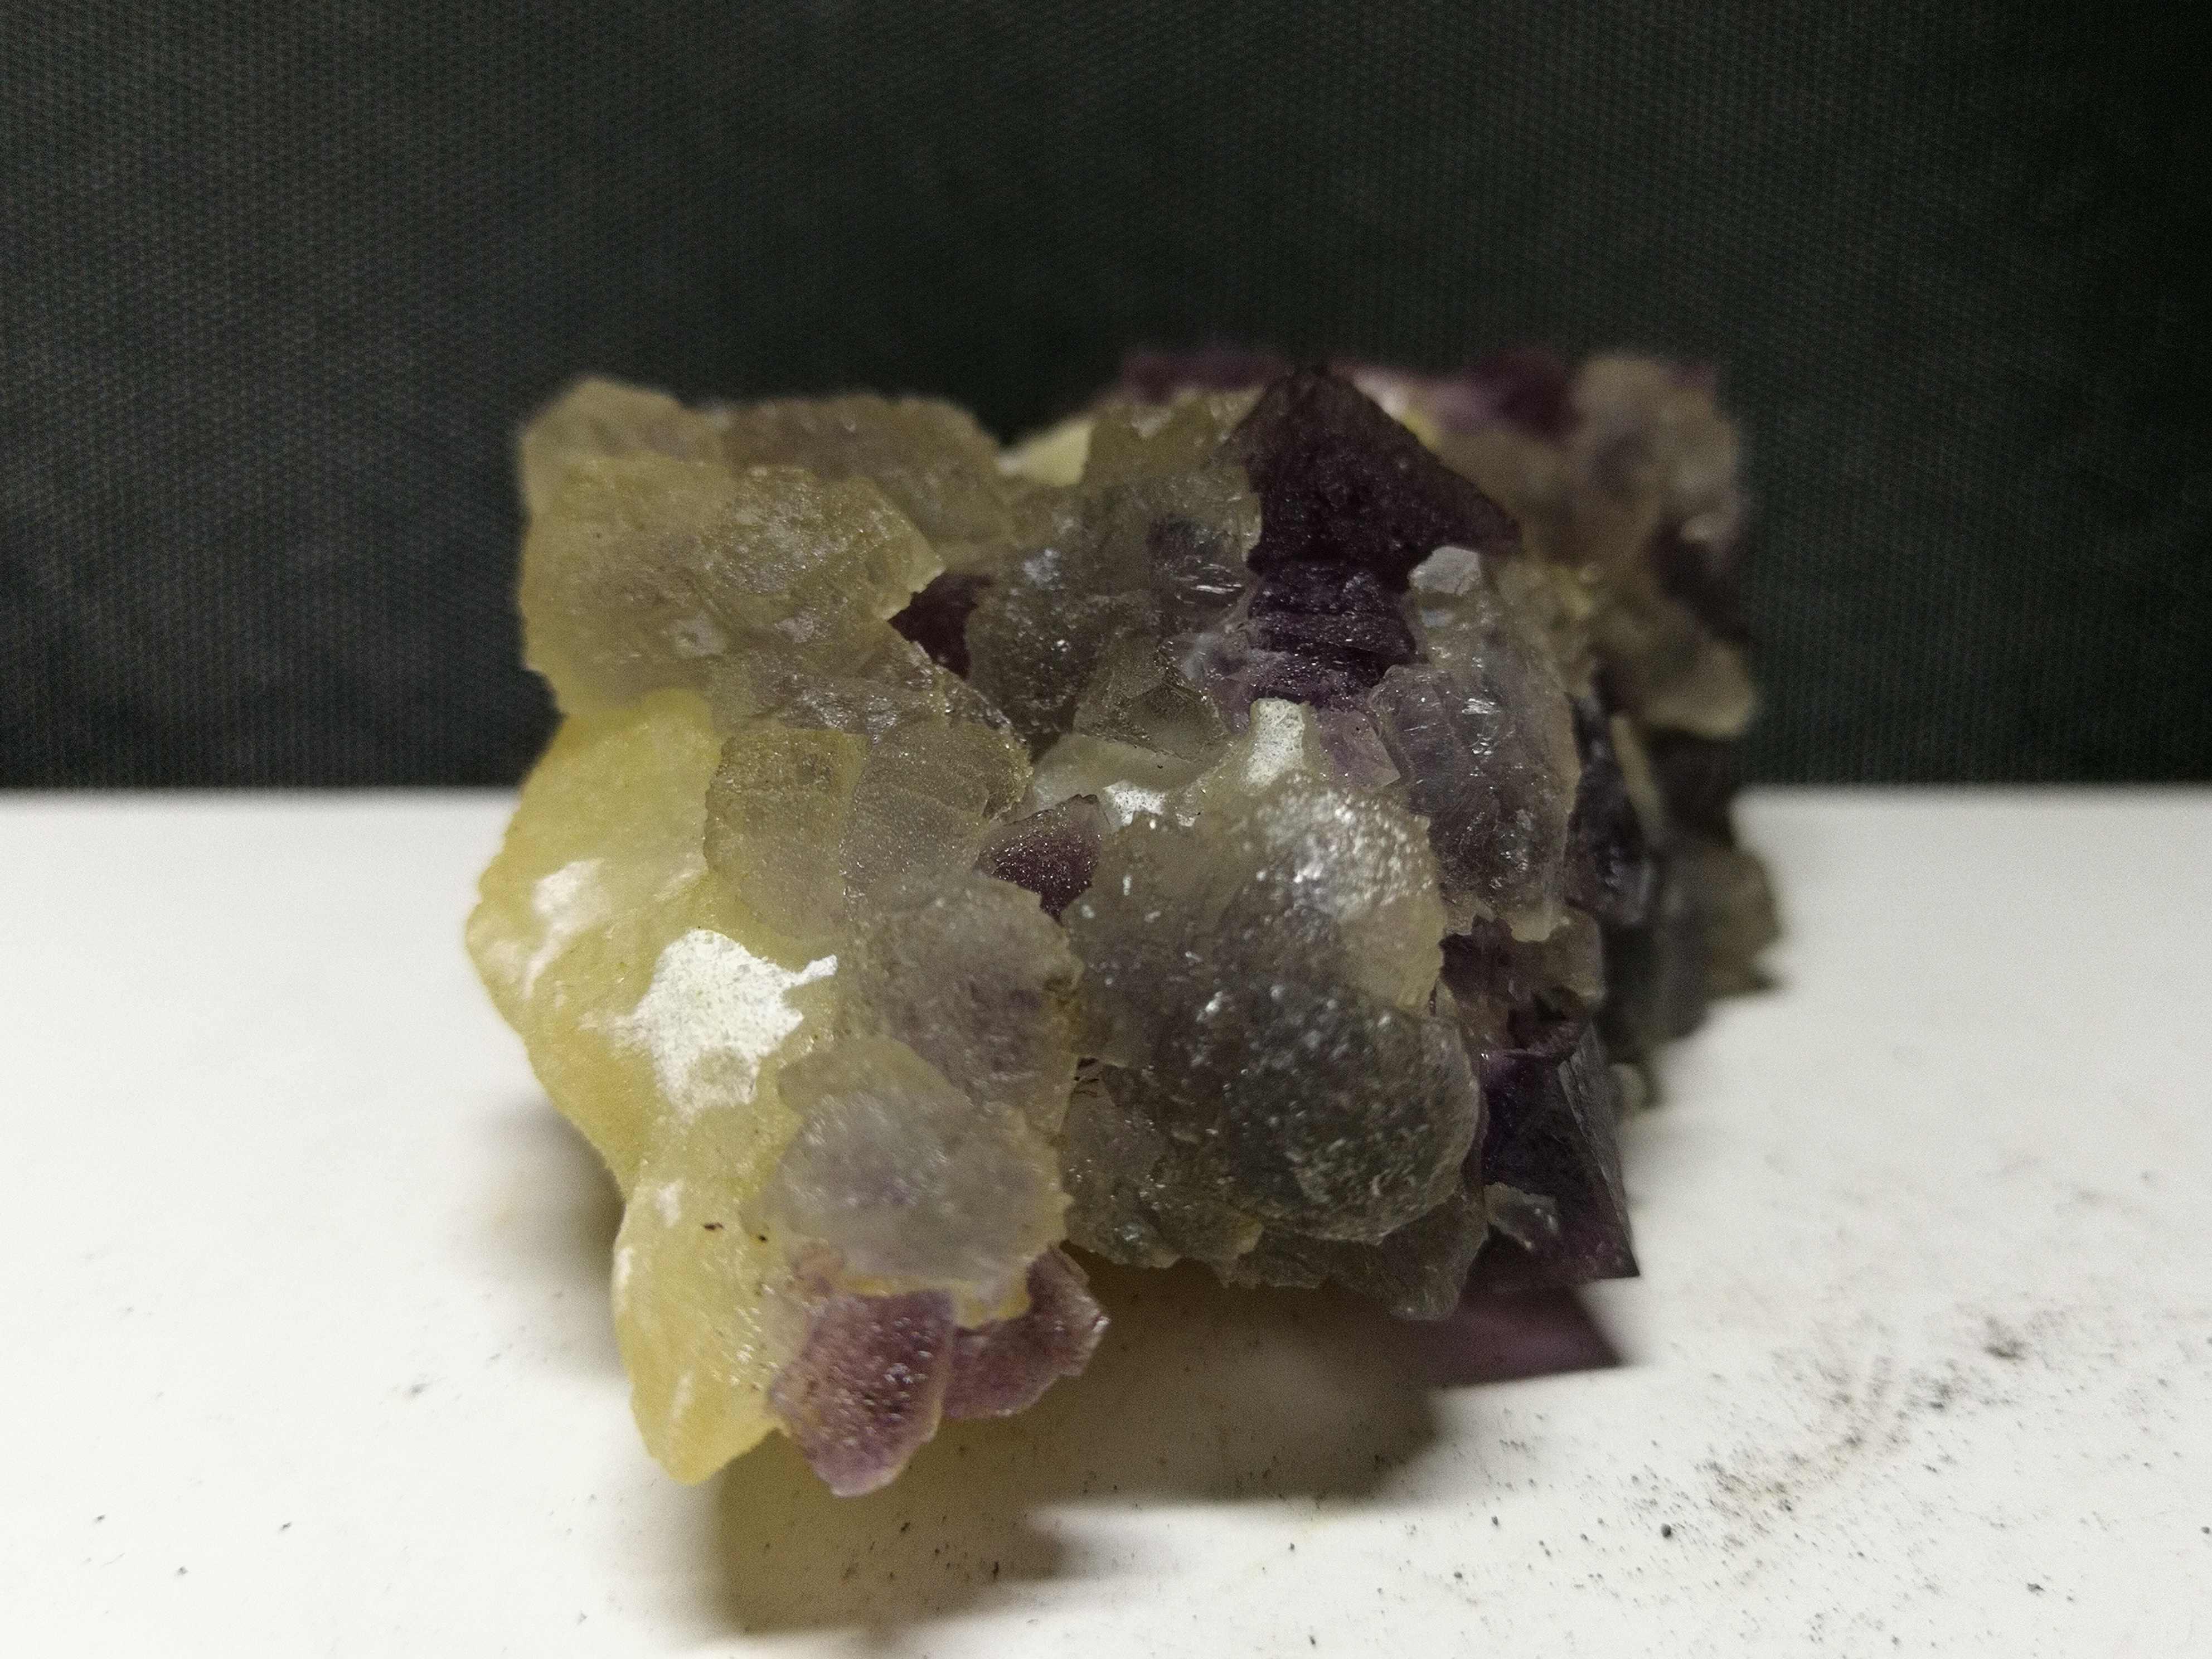 123.5 gnatural roxo fluorite mineral espécime, cristal de quartzo, ornamento da mobília